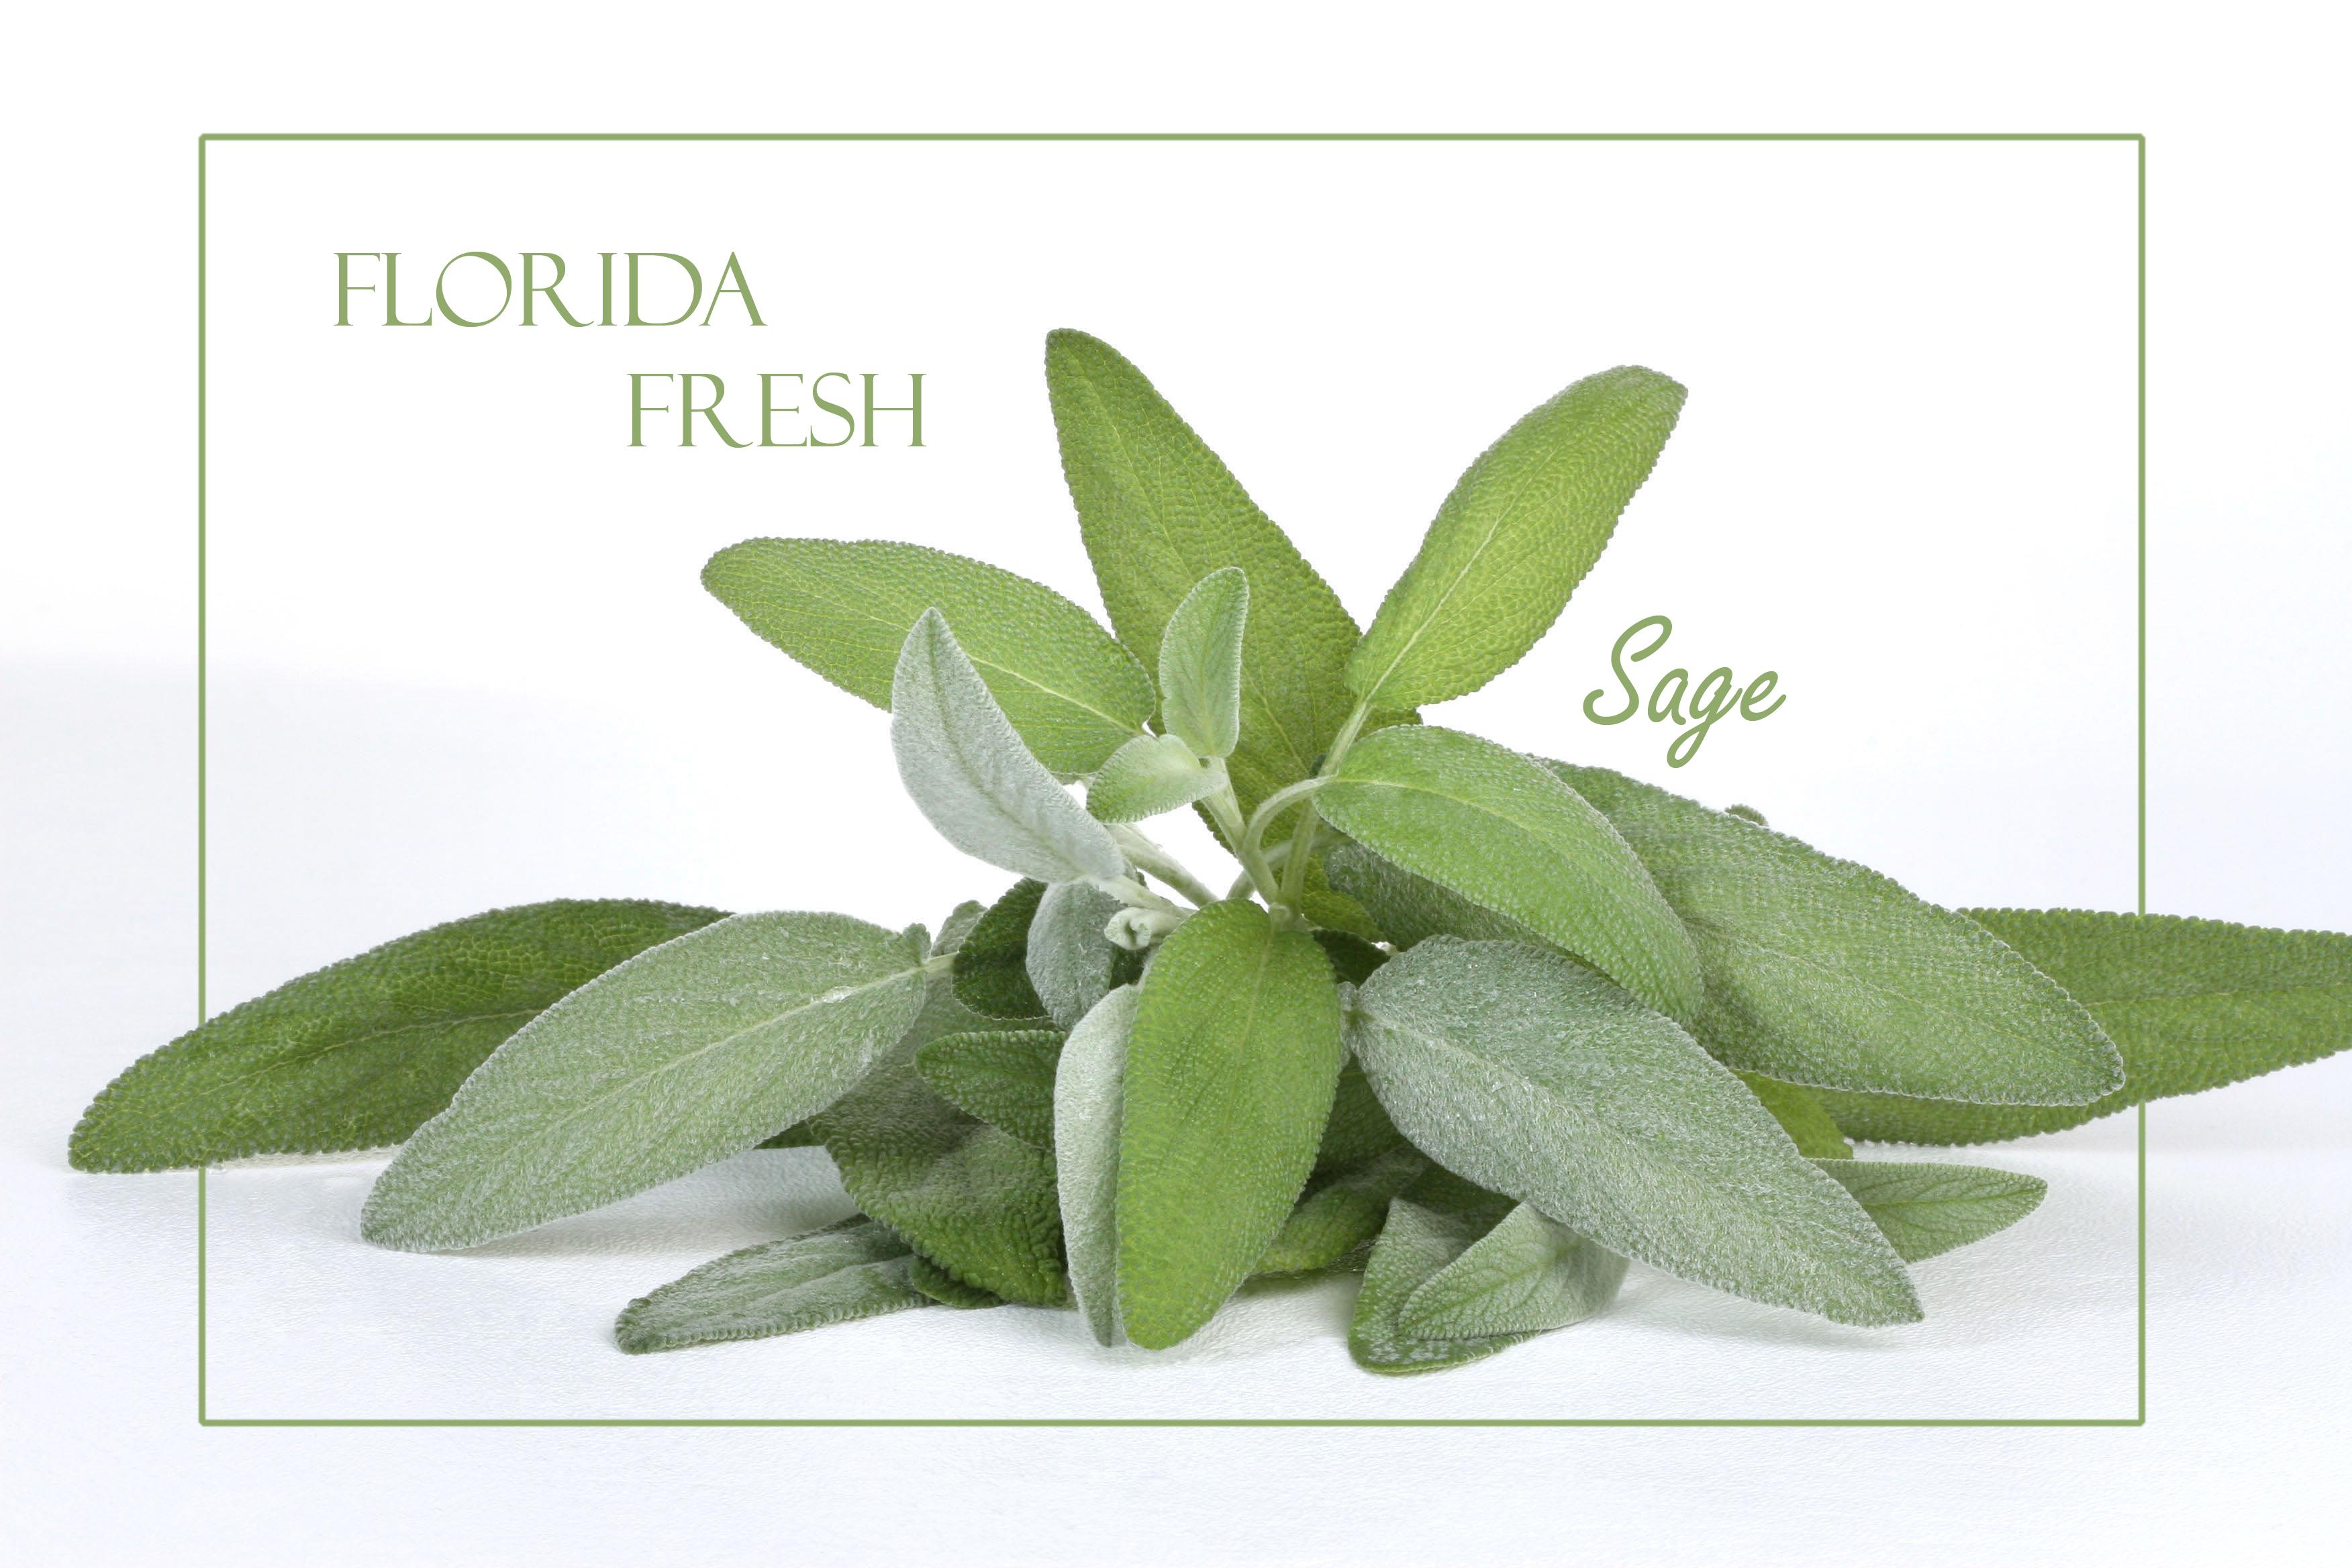 Herbs to treat sore throat